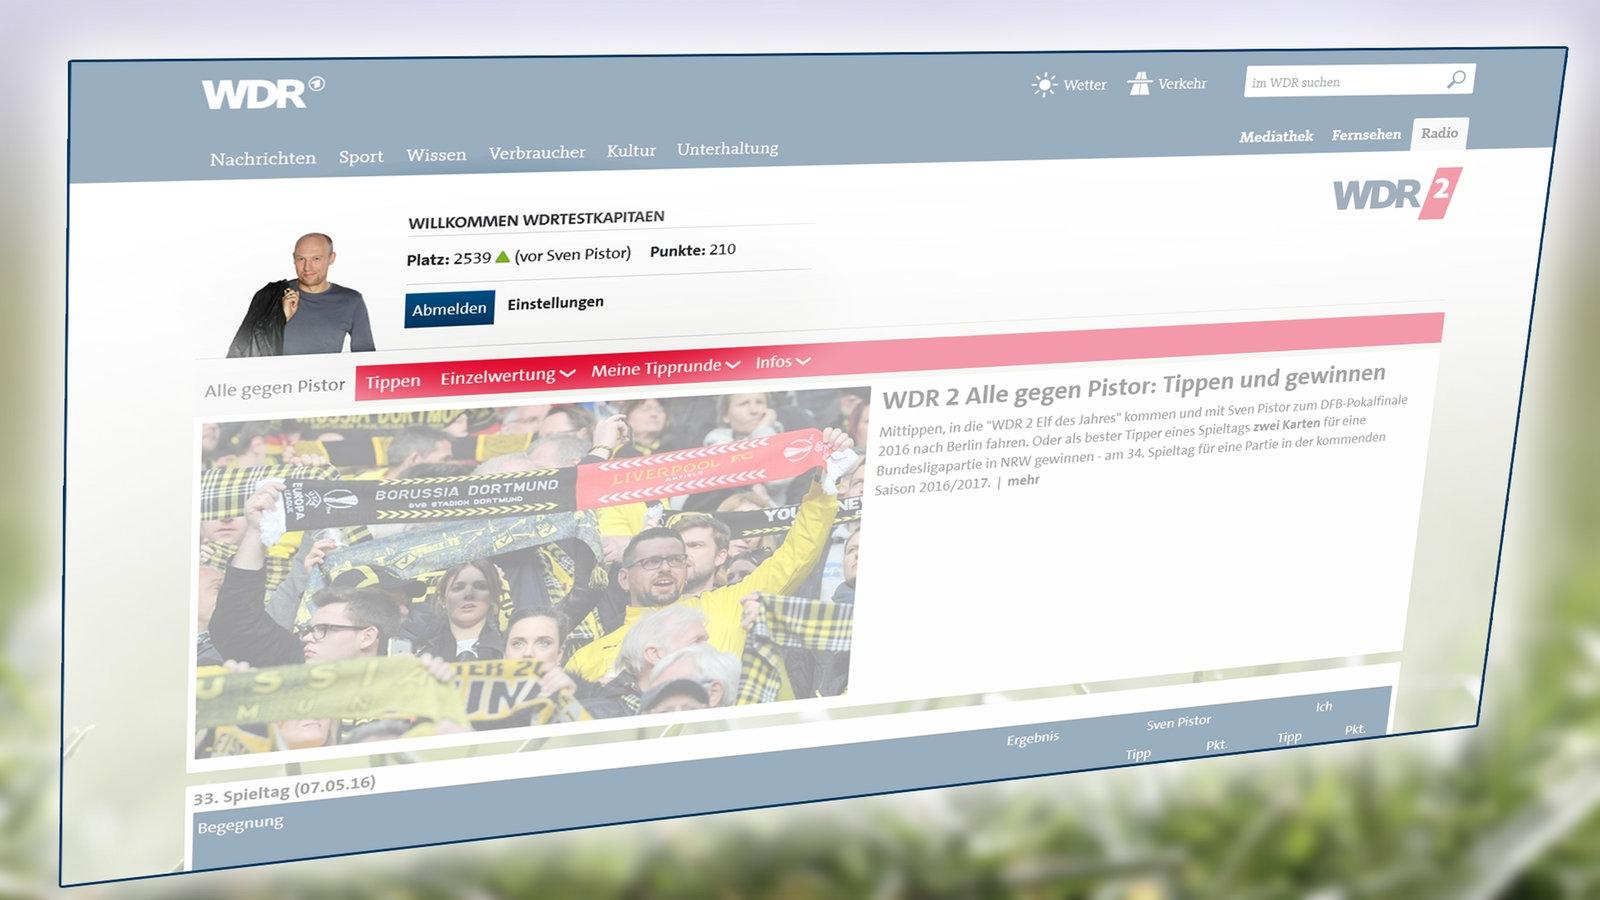 Http://Filme-Anschauen-Kostenlos.De/Tv/Rtl-Stream